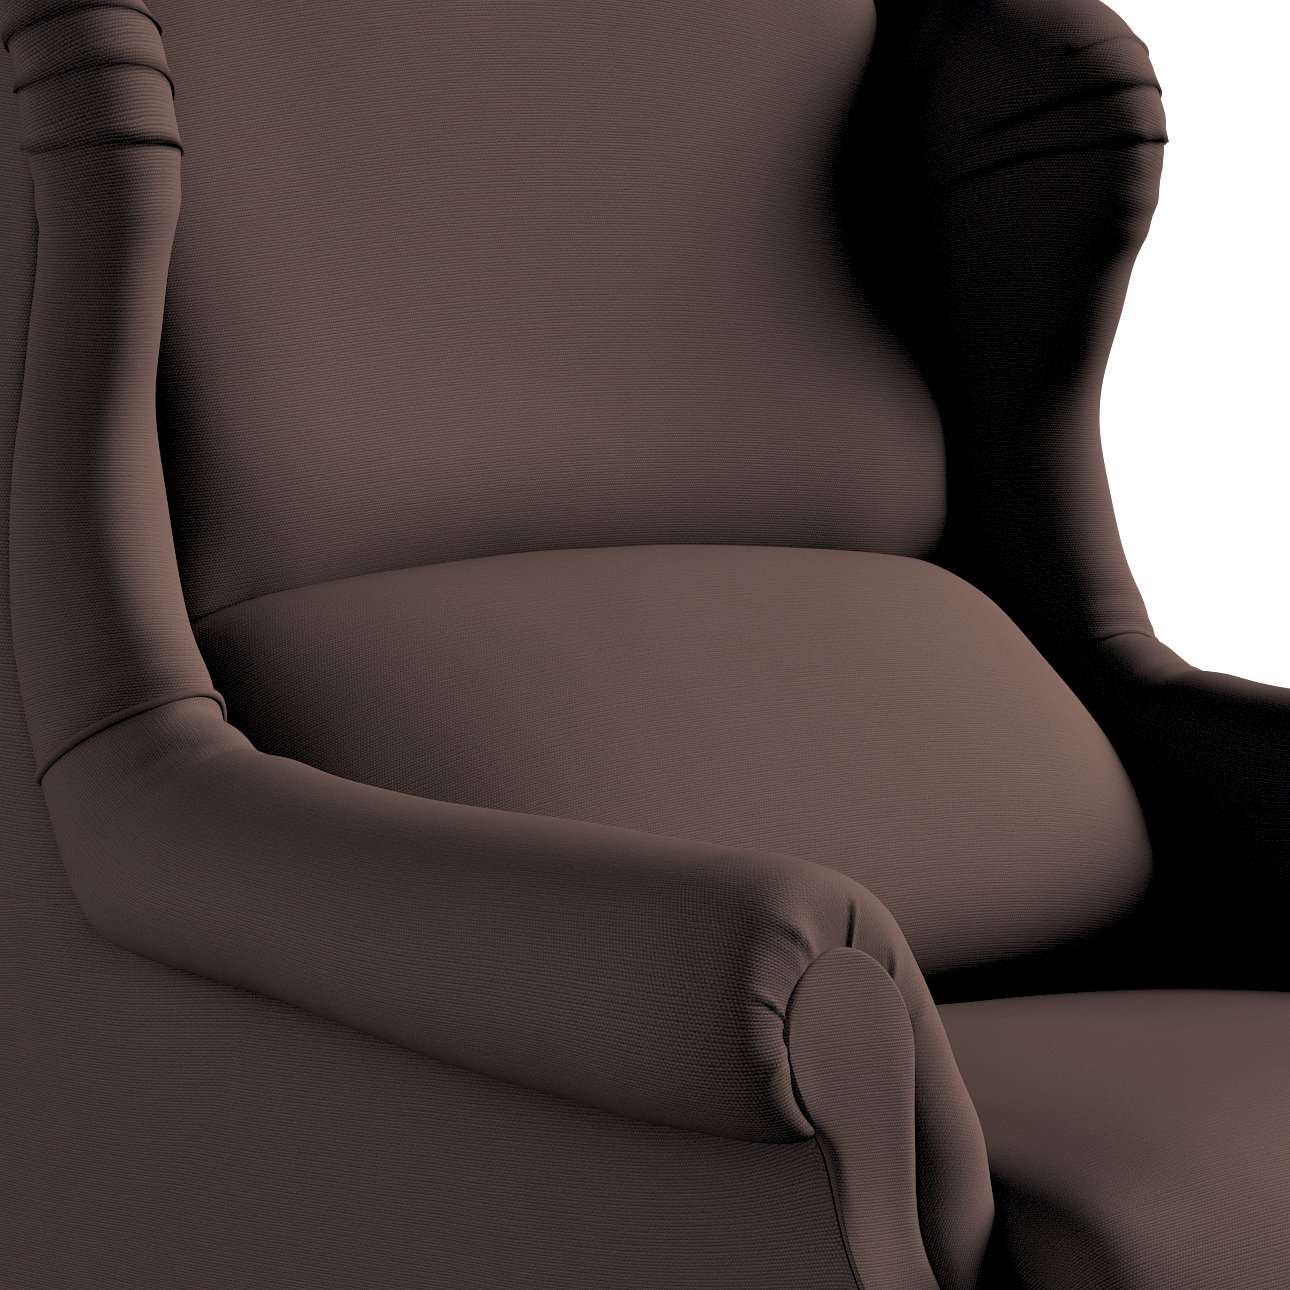 Fotel Unique w kolekcji Cotton Panama, tkanina: 702-03